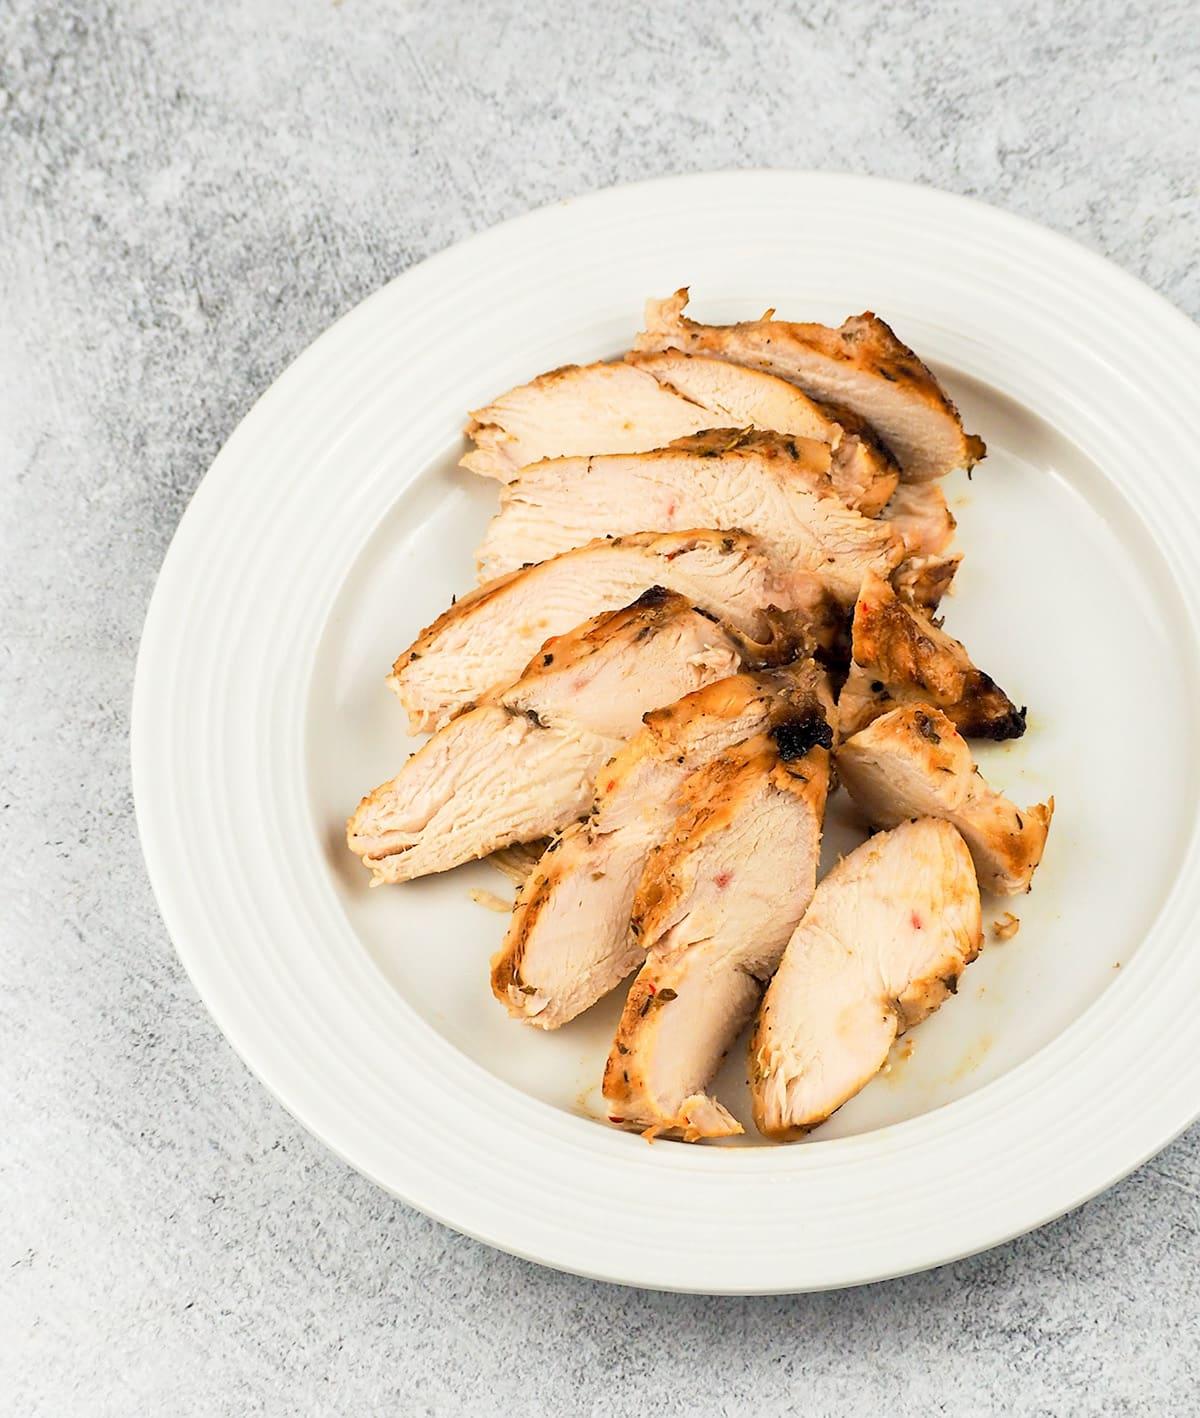 sliced chicken on plate